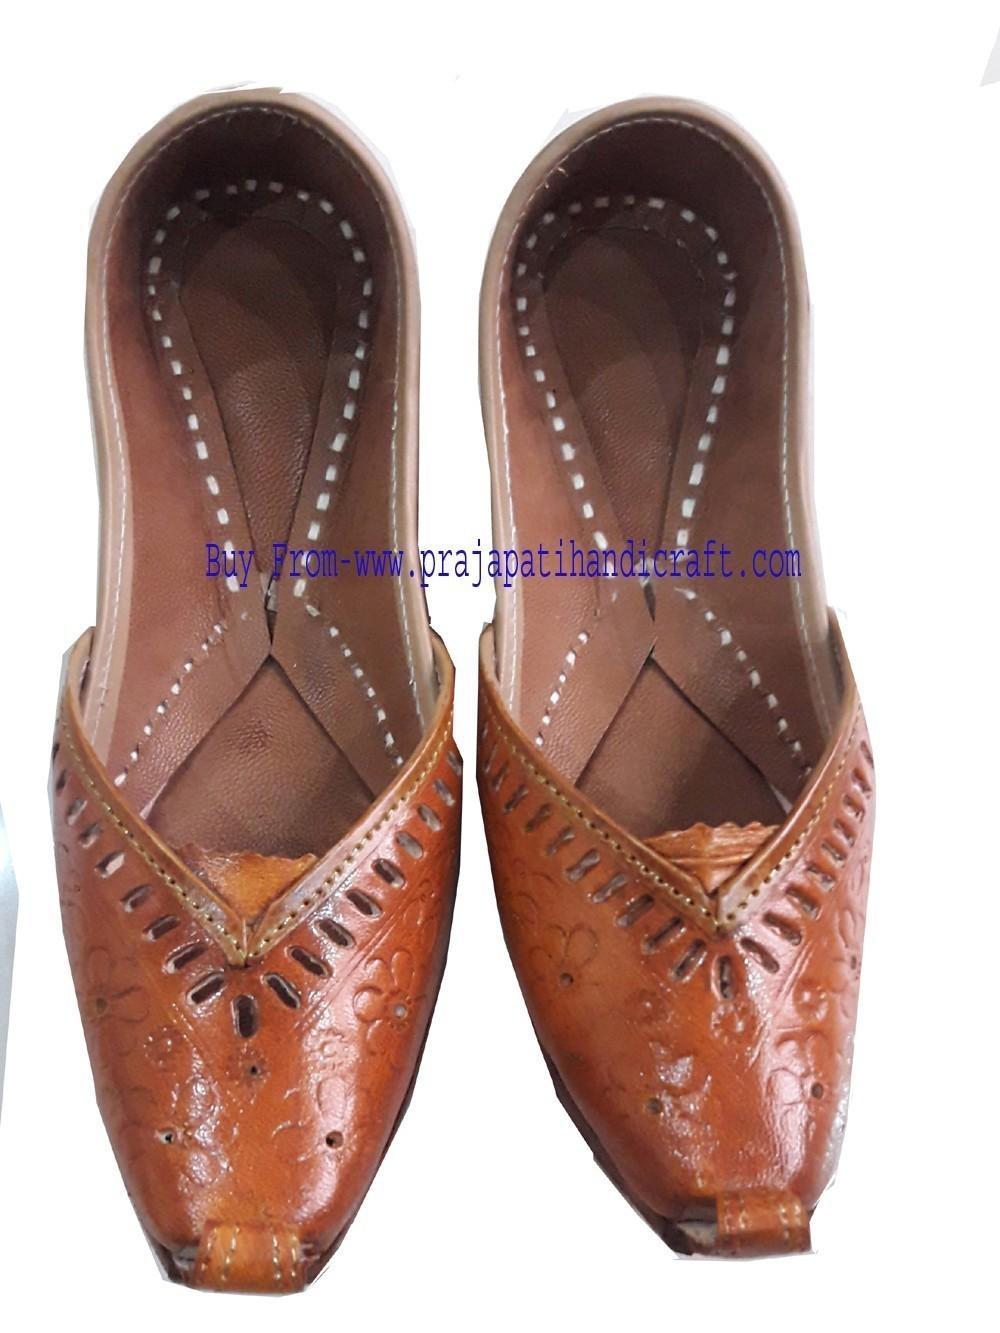 punjabi jutti khussa shoes indian shoes  leather shoes